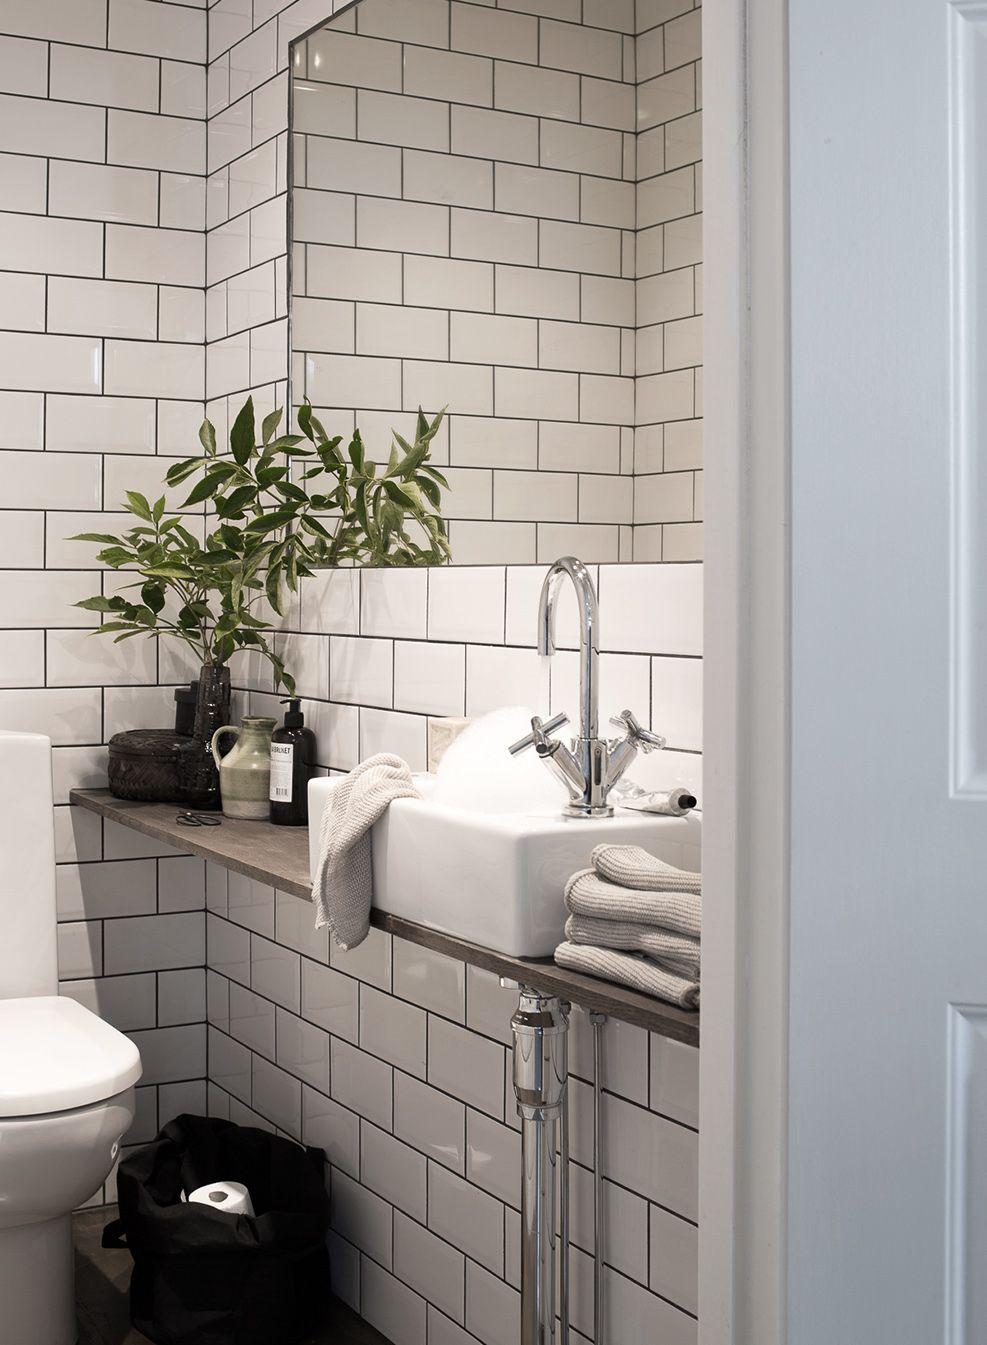 guest toilet photo daniella witte banos pinterest guest small bathroom